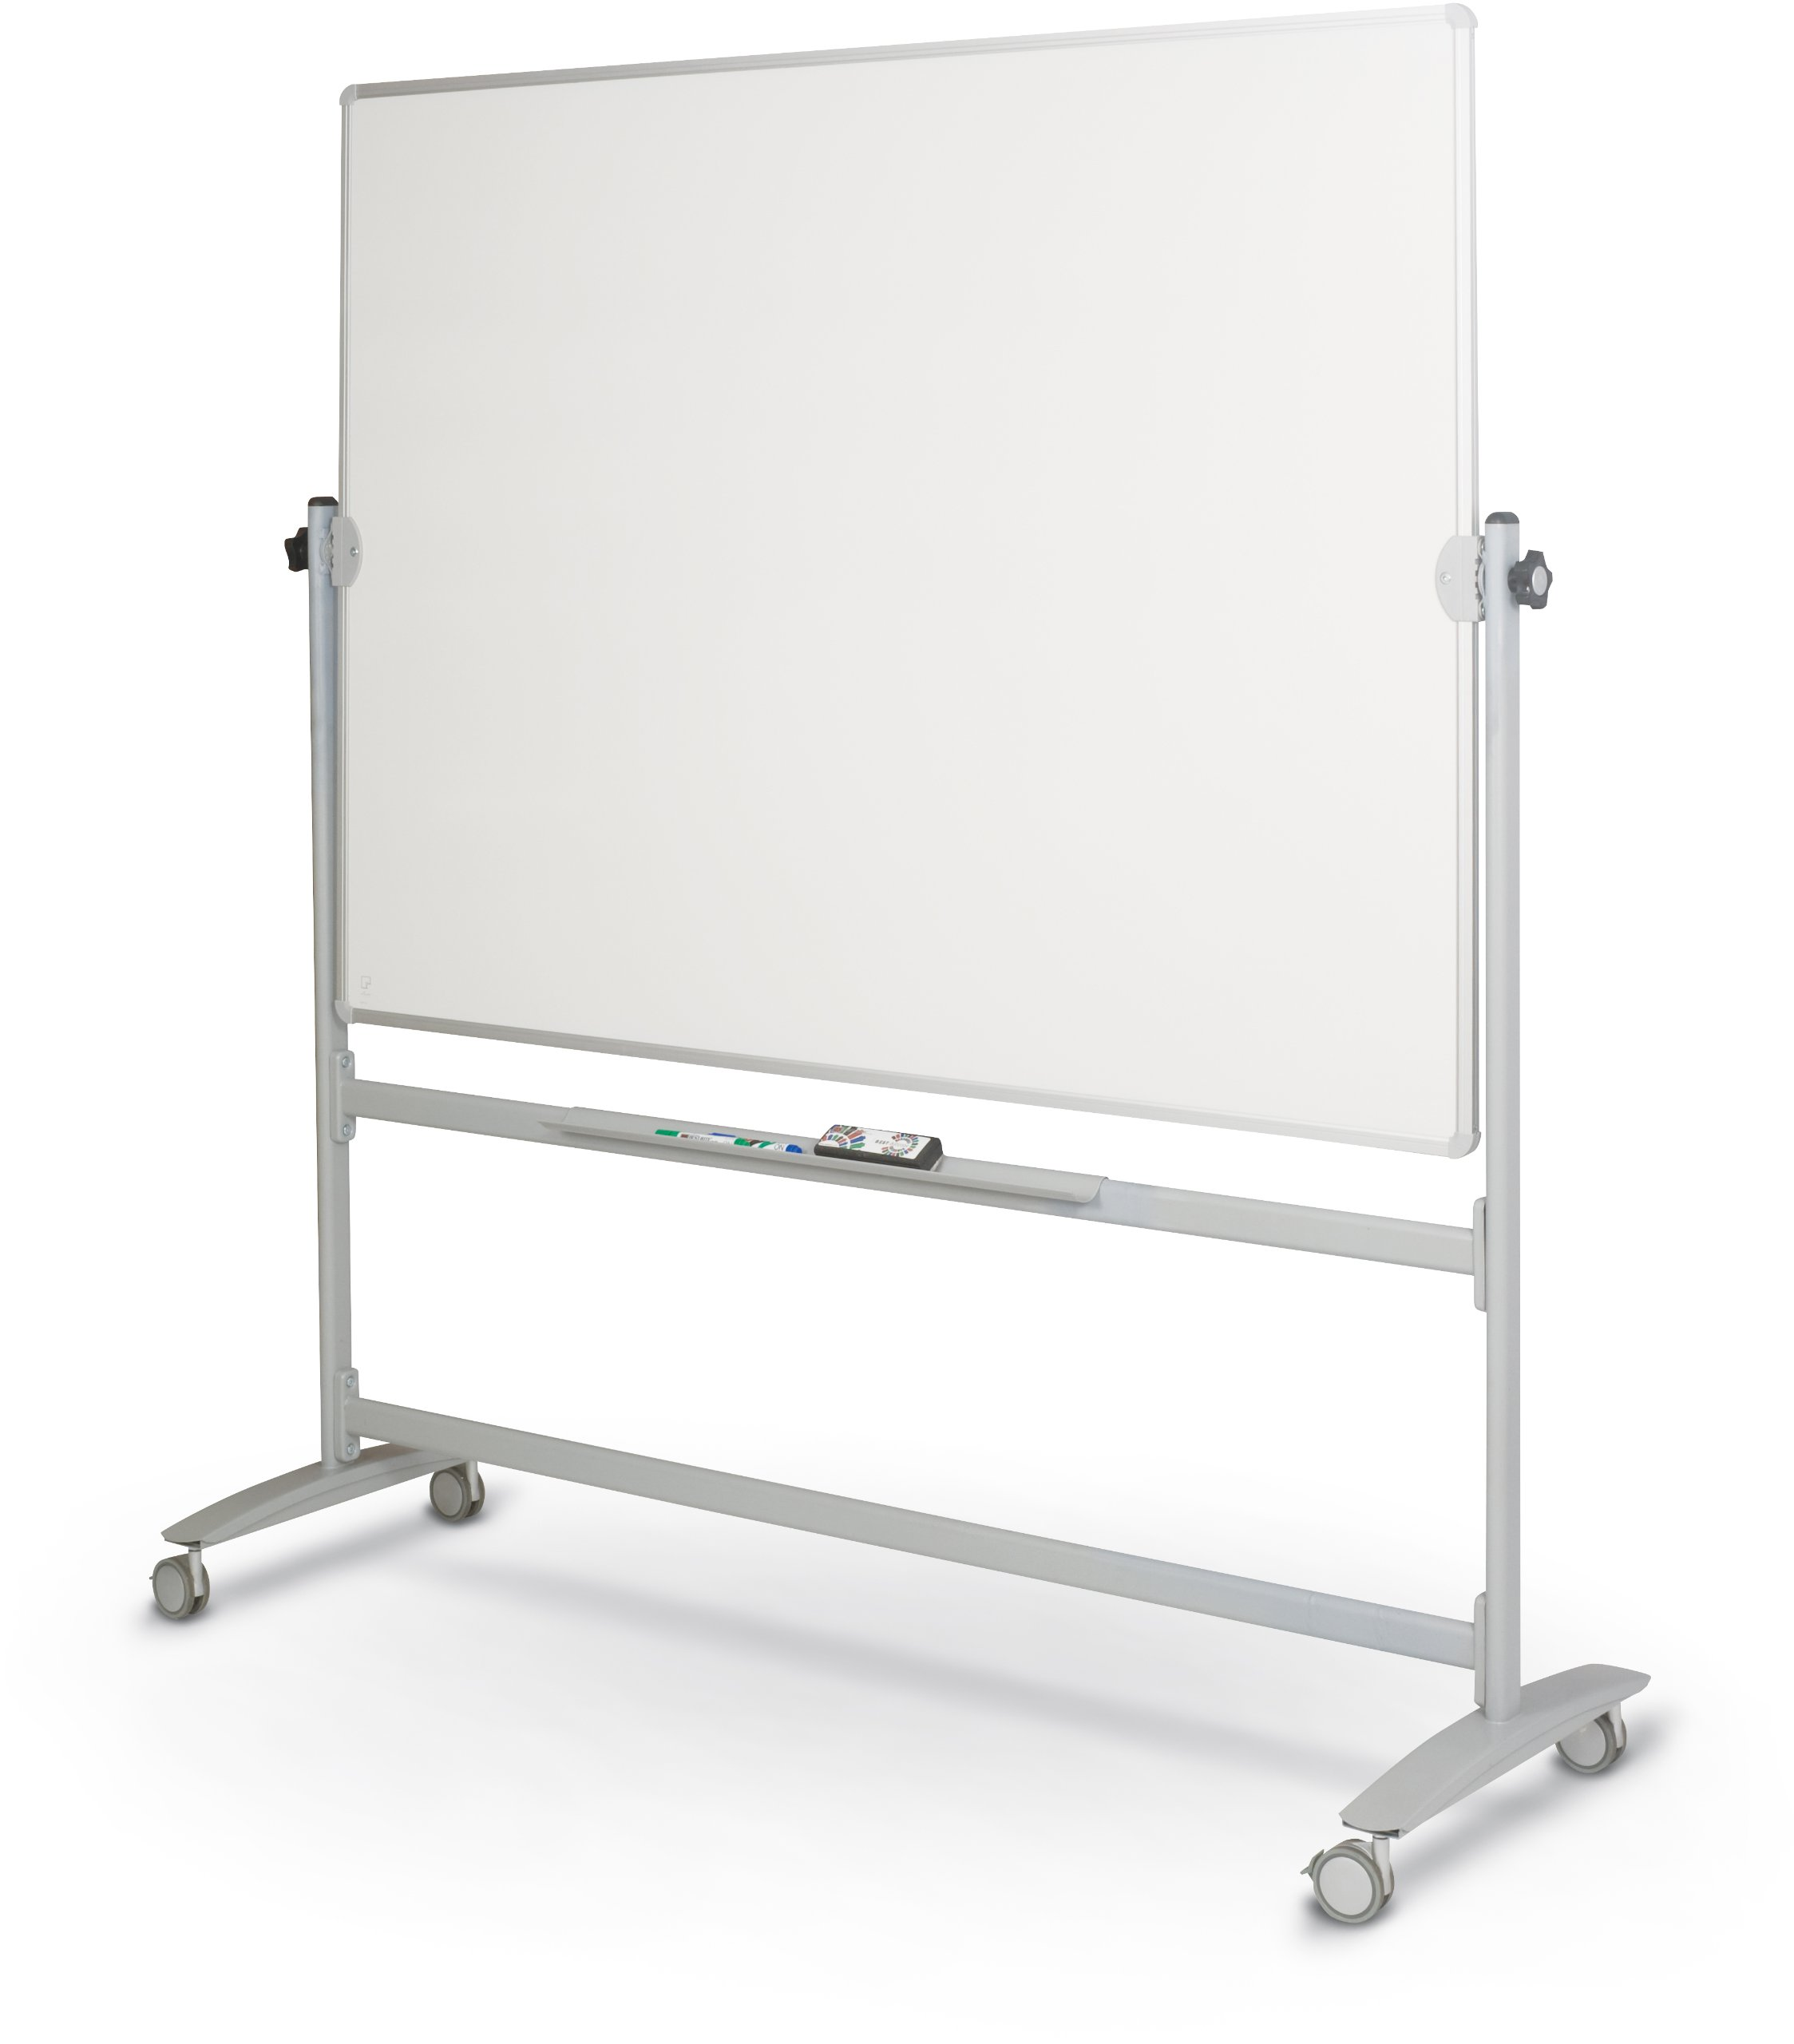 Best-Rite Lumina Rversible Mobile Dry Erase Whiteboard Easel, 4'H x 5'W Dura-Rite HPL Markerboard, Silver Frame (62383)